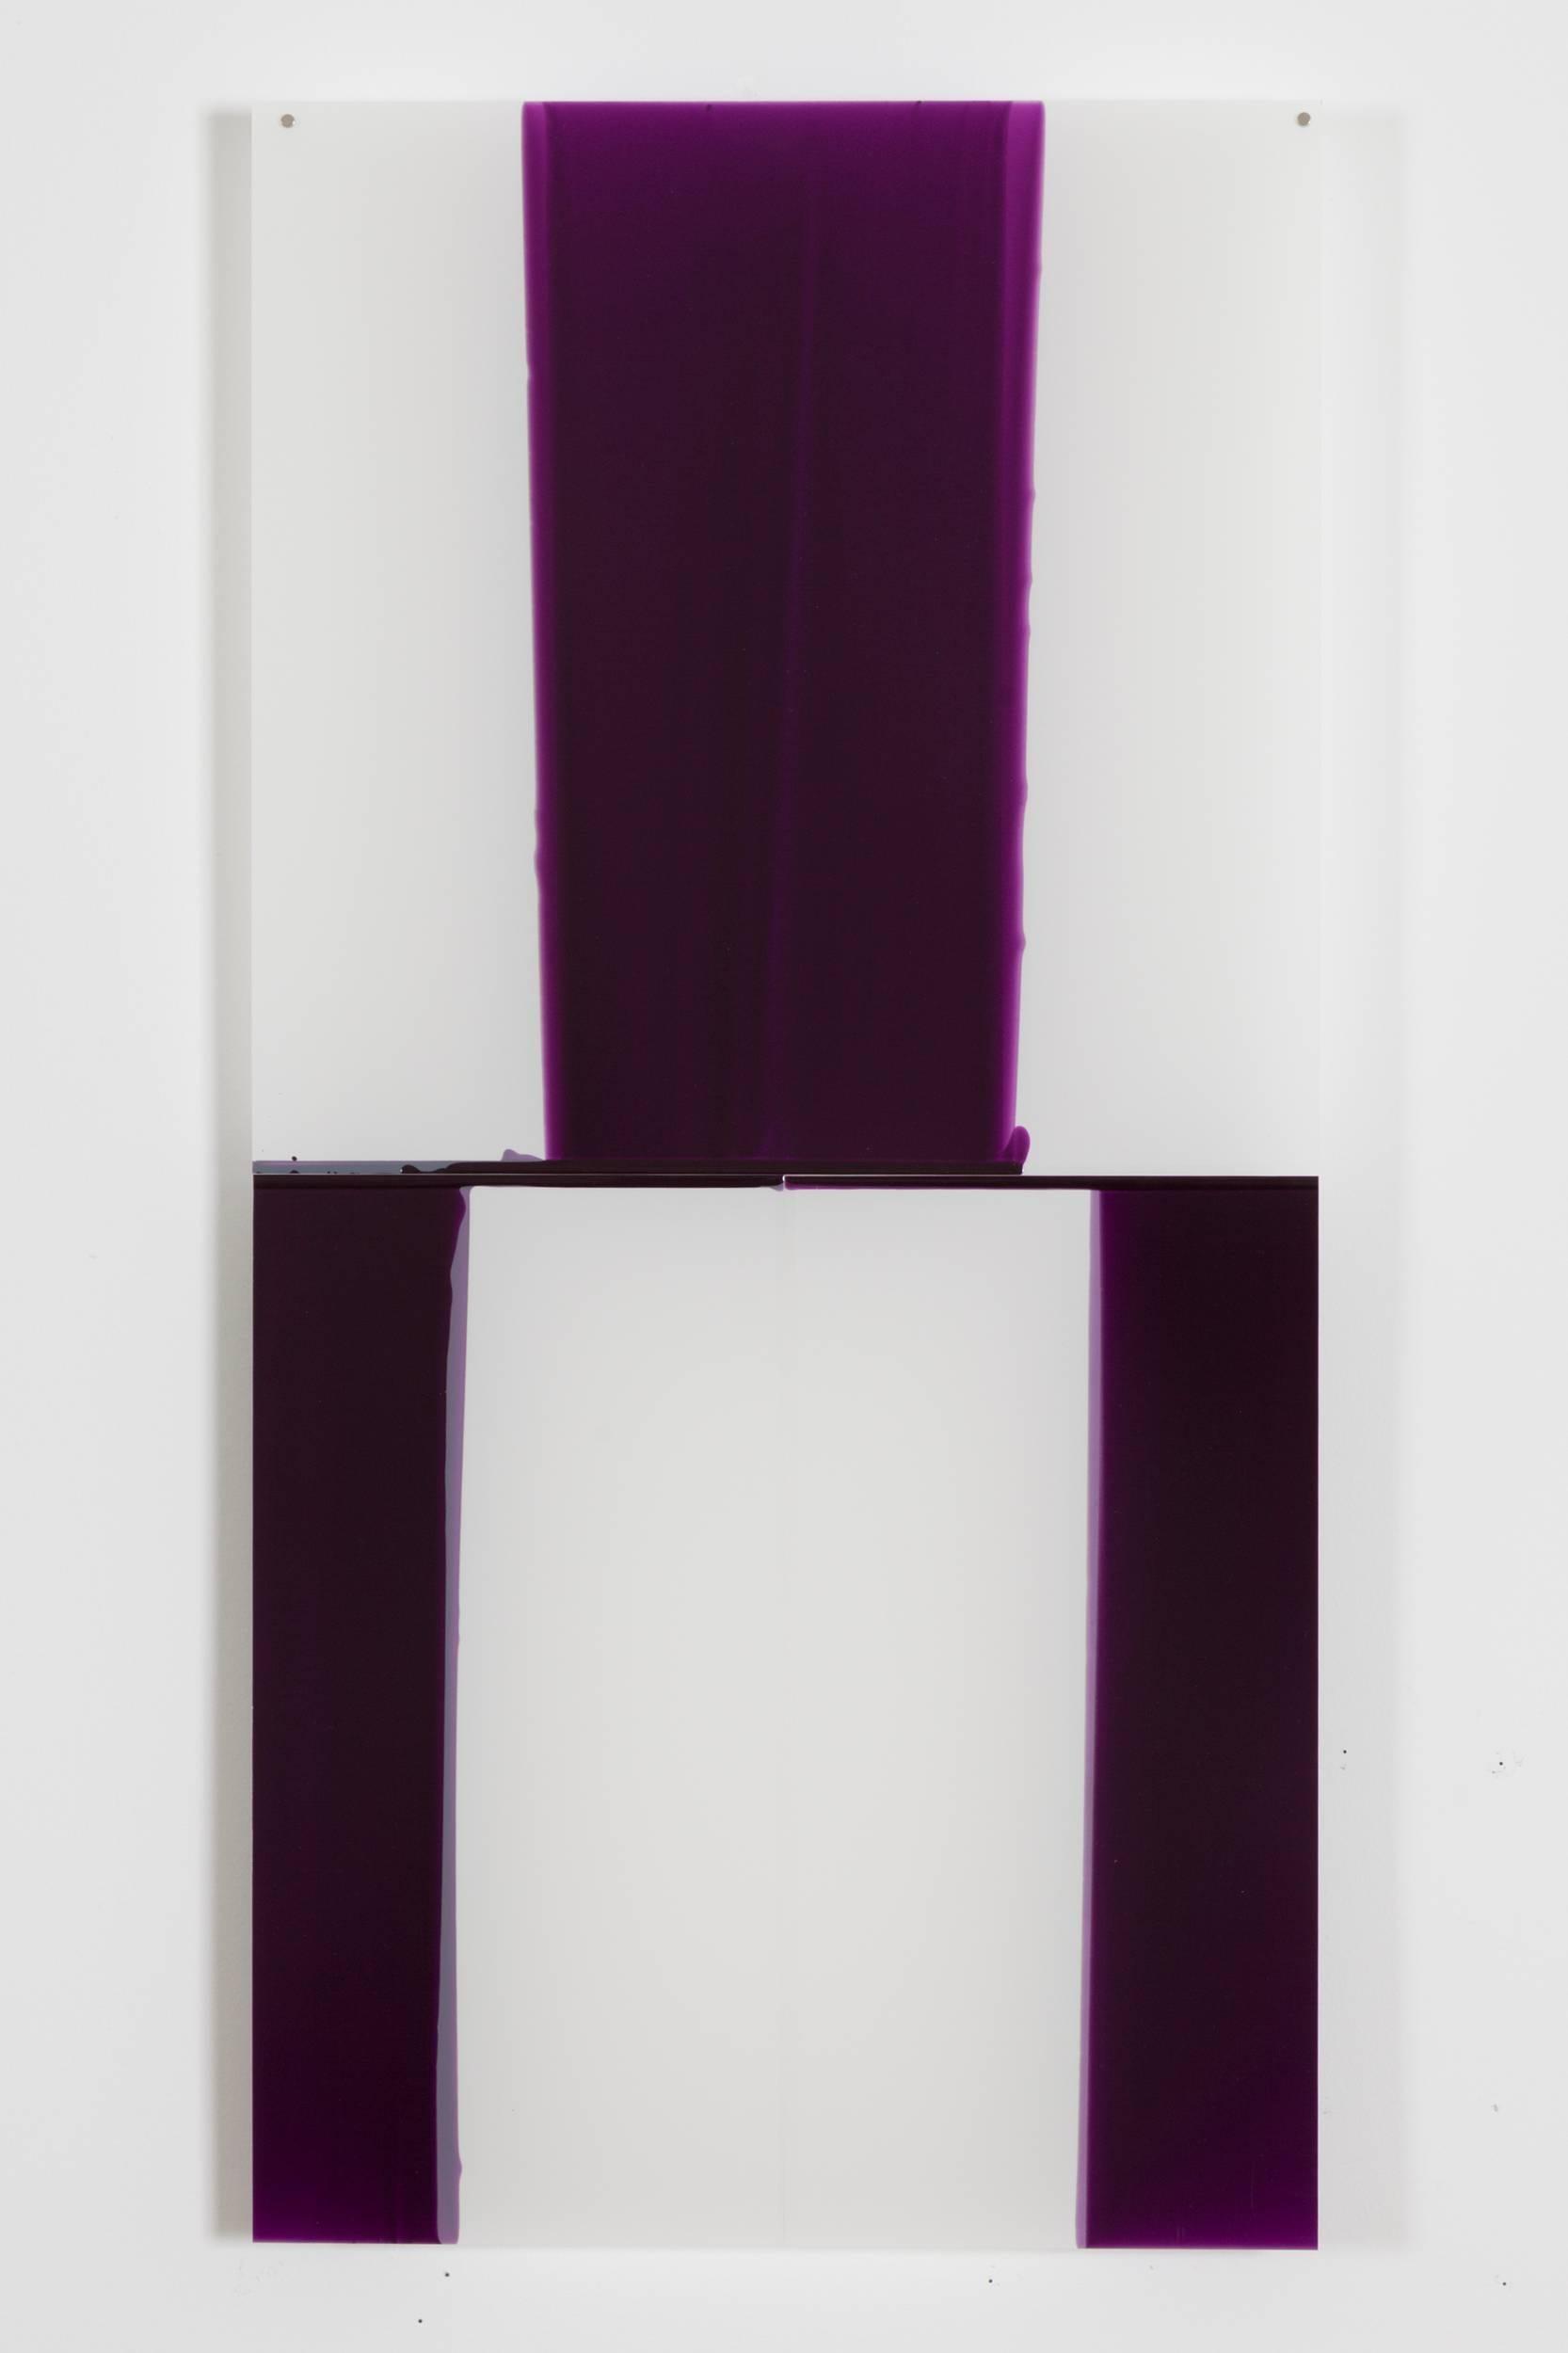 Mary Schiliro, Random Dip 3, 2015, Painting, Acrylic on Mylar, Abstraction